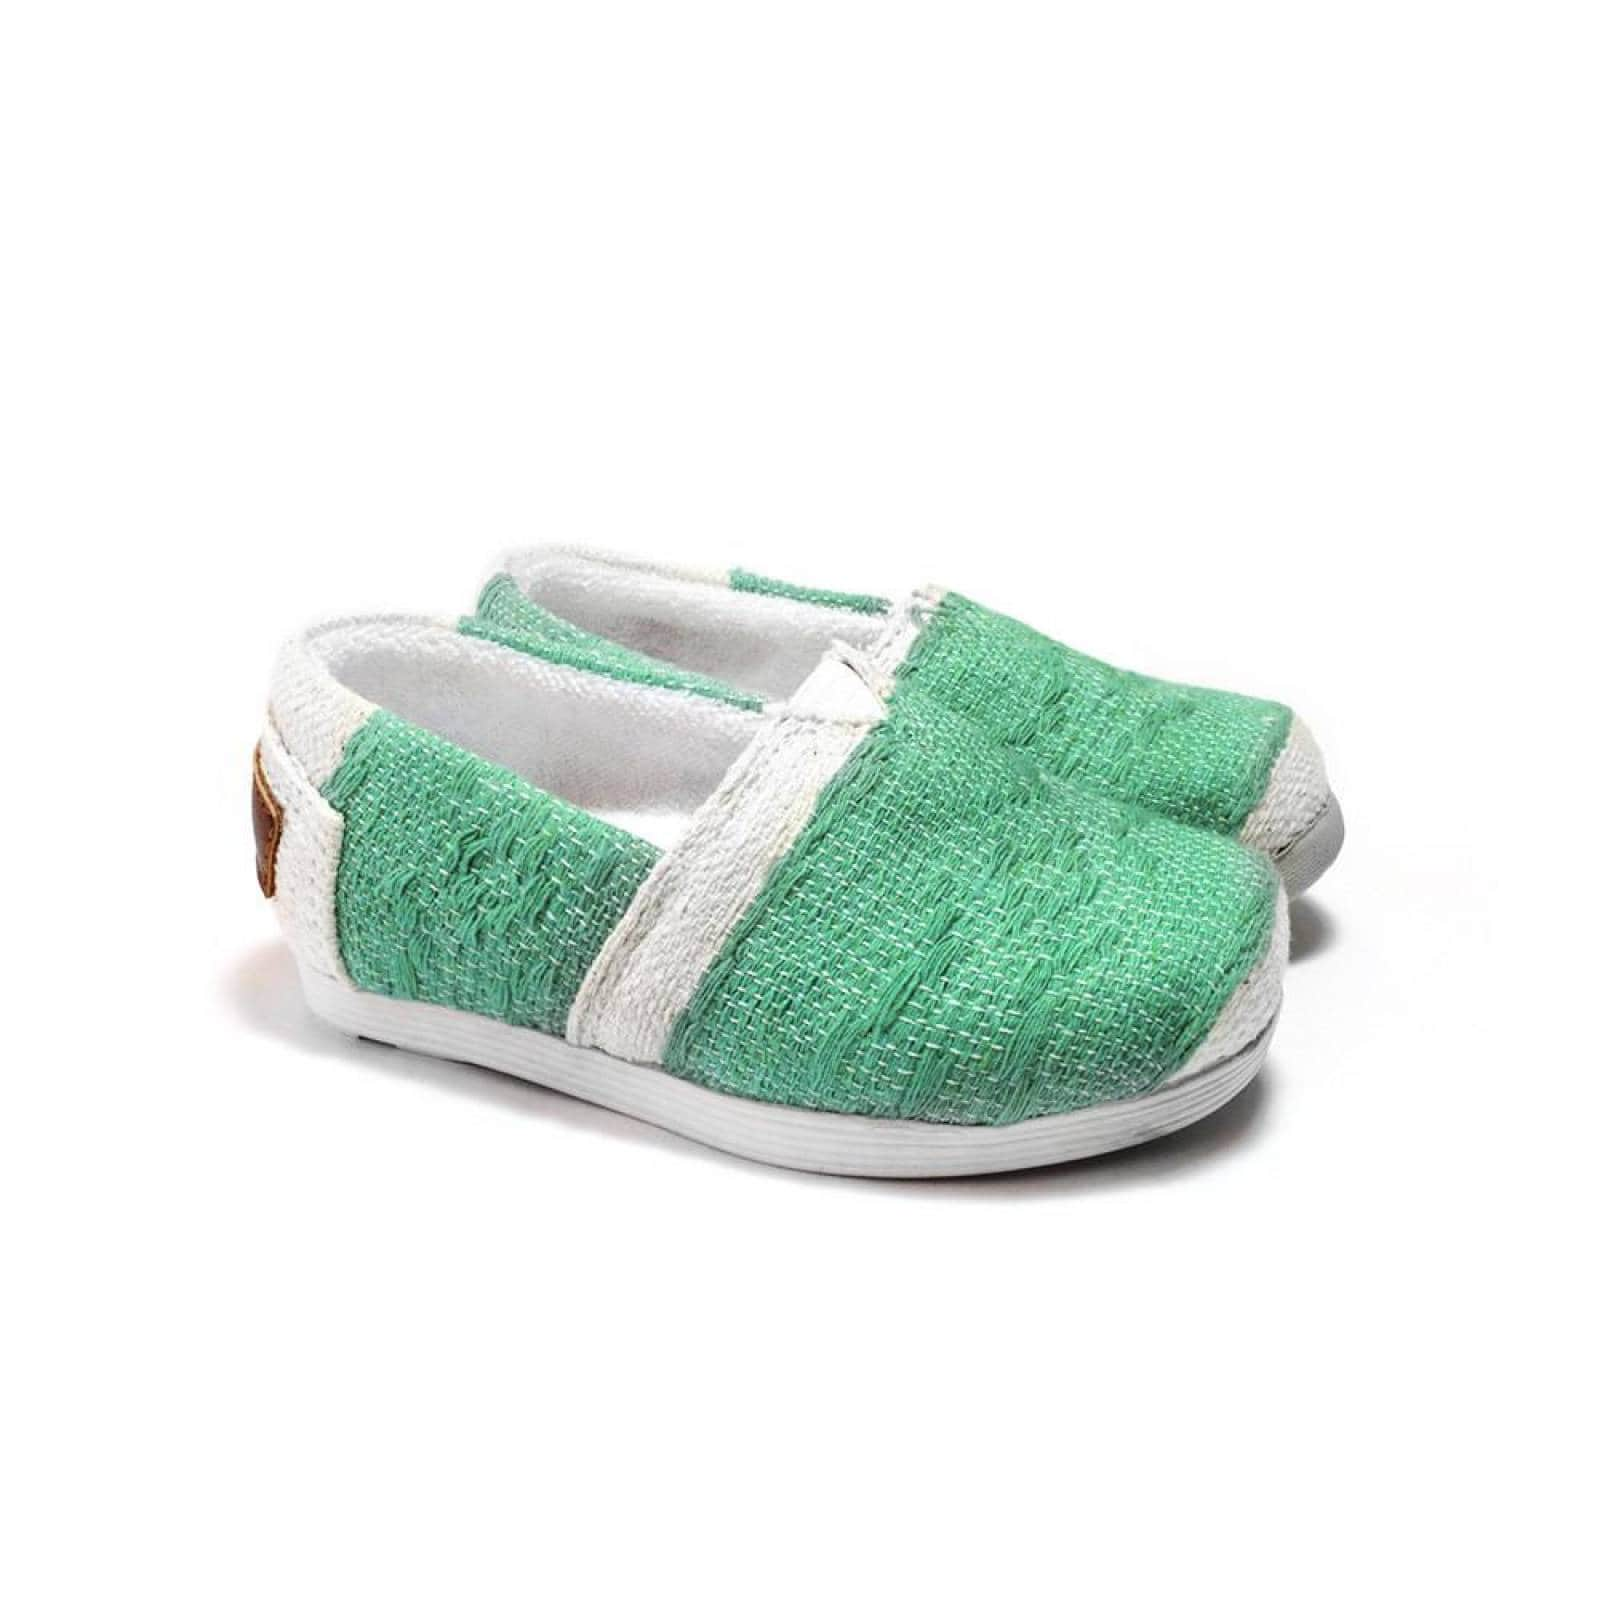 Zapato Alpargata Mini Jacinta Artesanal Tela Infantil Verde Komoni Talla: 14